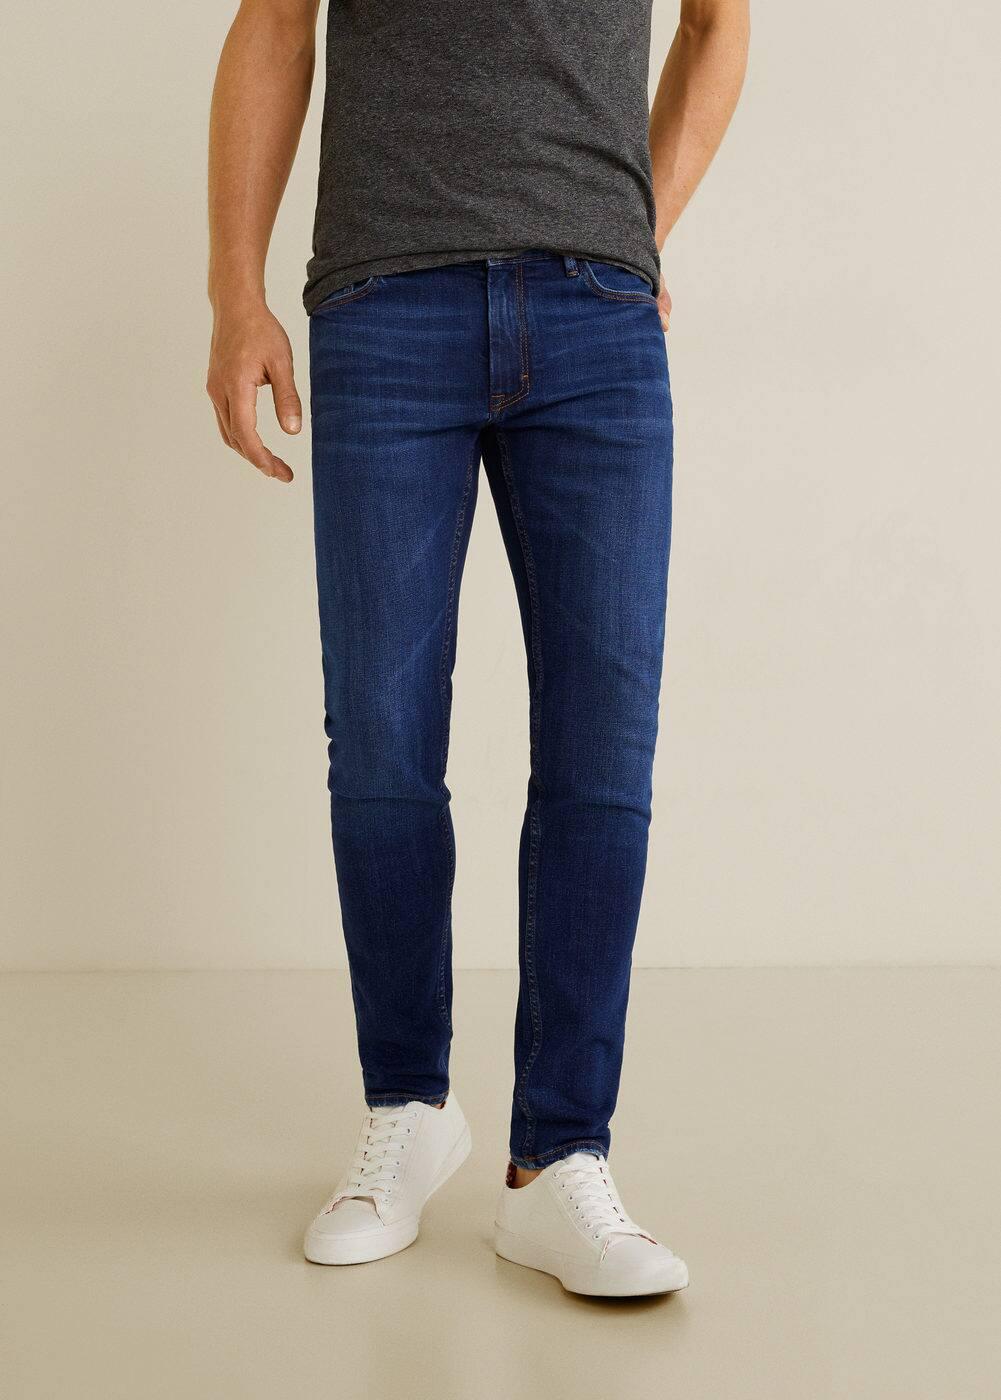 h-jude5:jeans jude skinny lavado oscuro